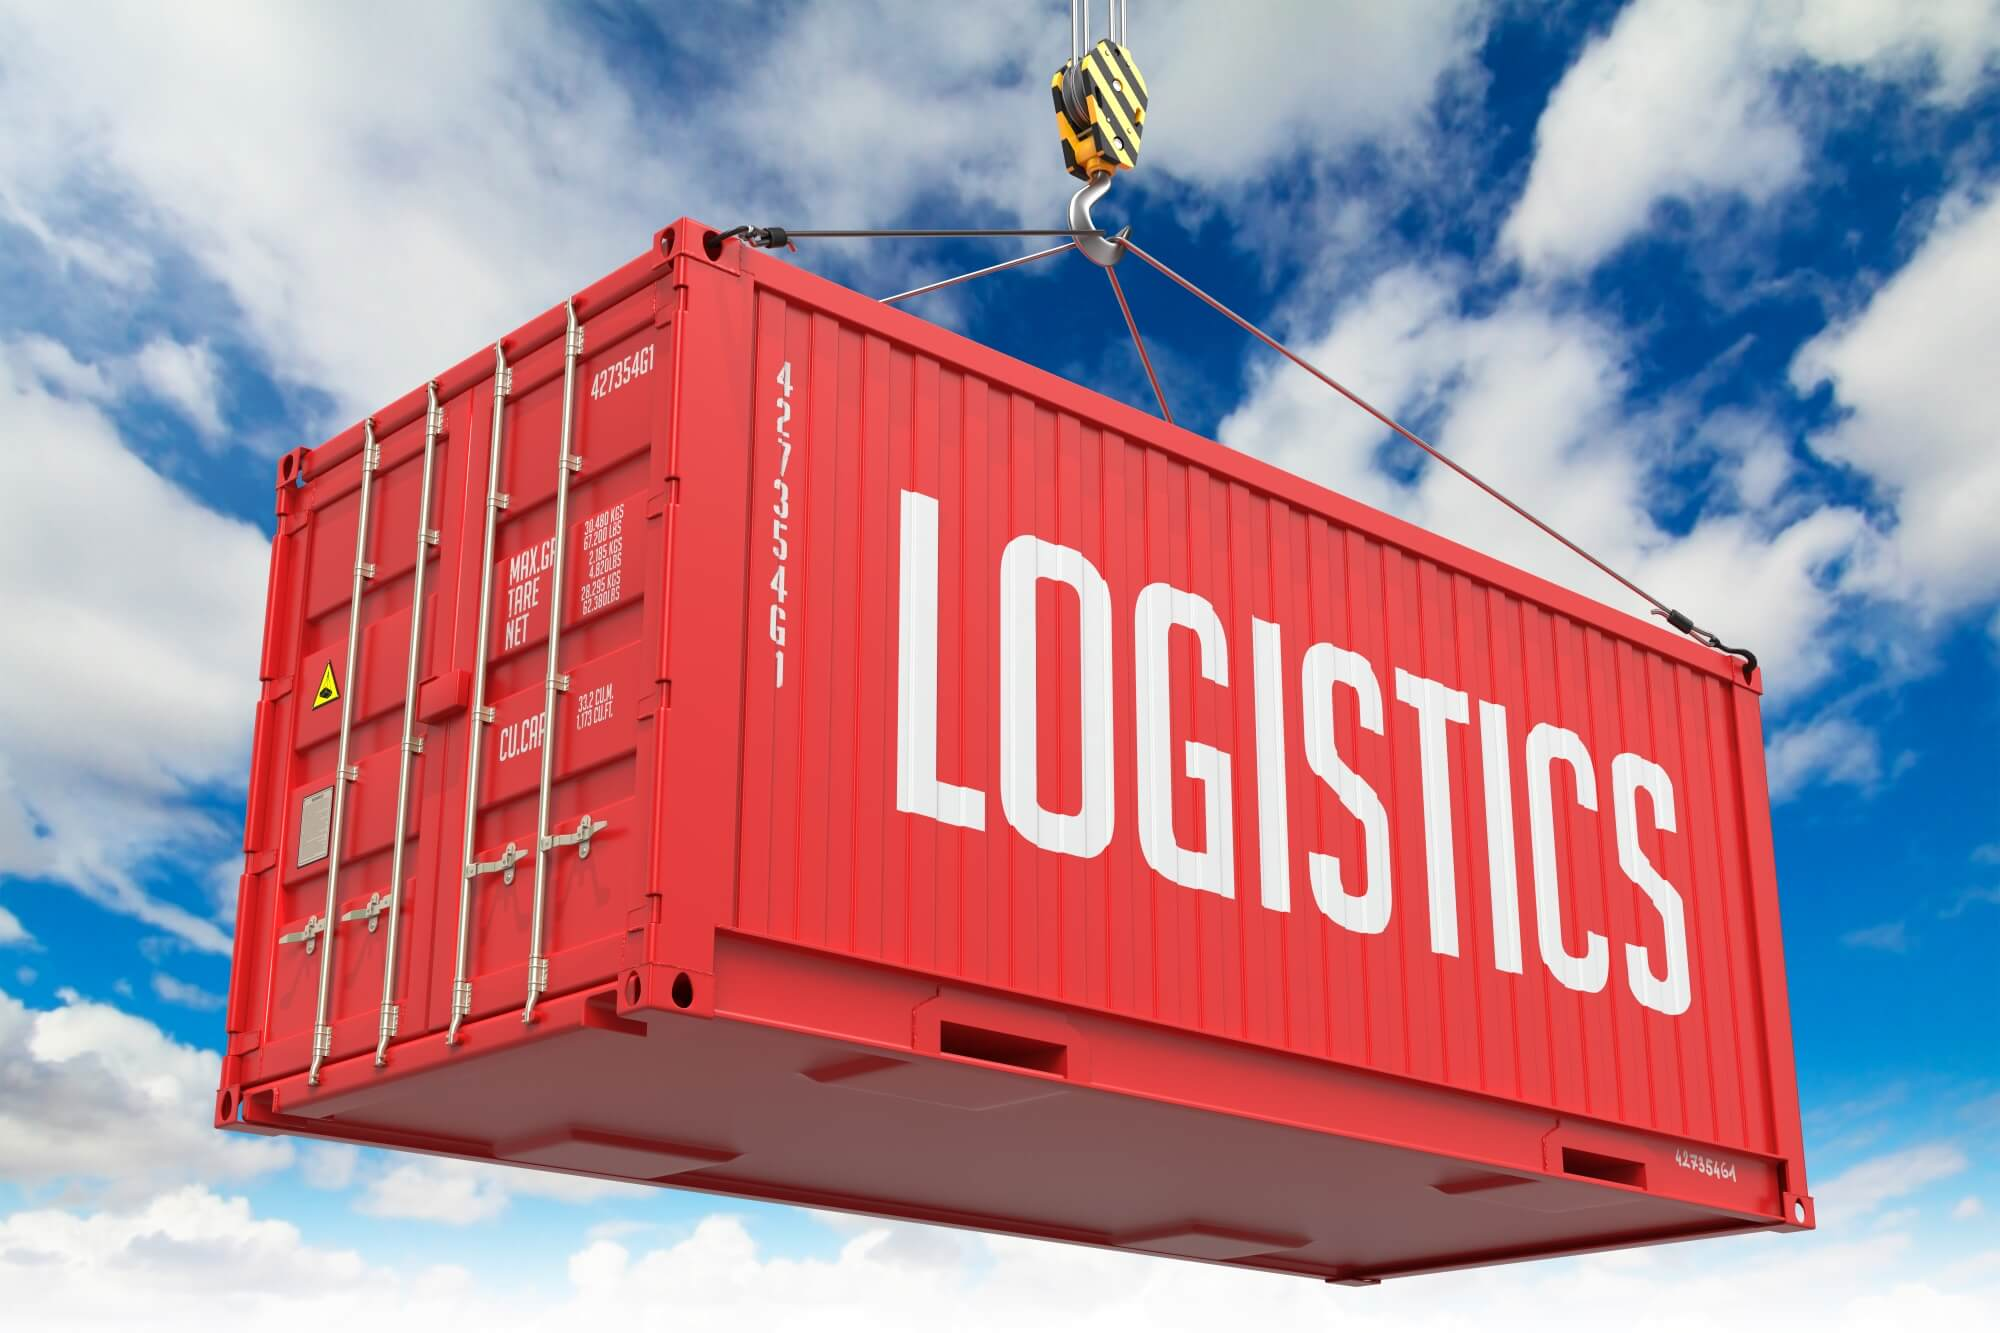 https://www.cipelog.com/wp-content/uploads/2018/04/logistics-789marketing.jpg